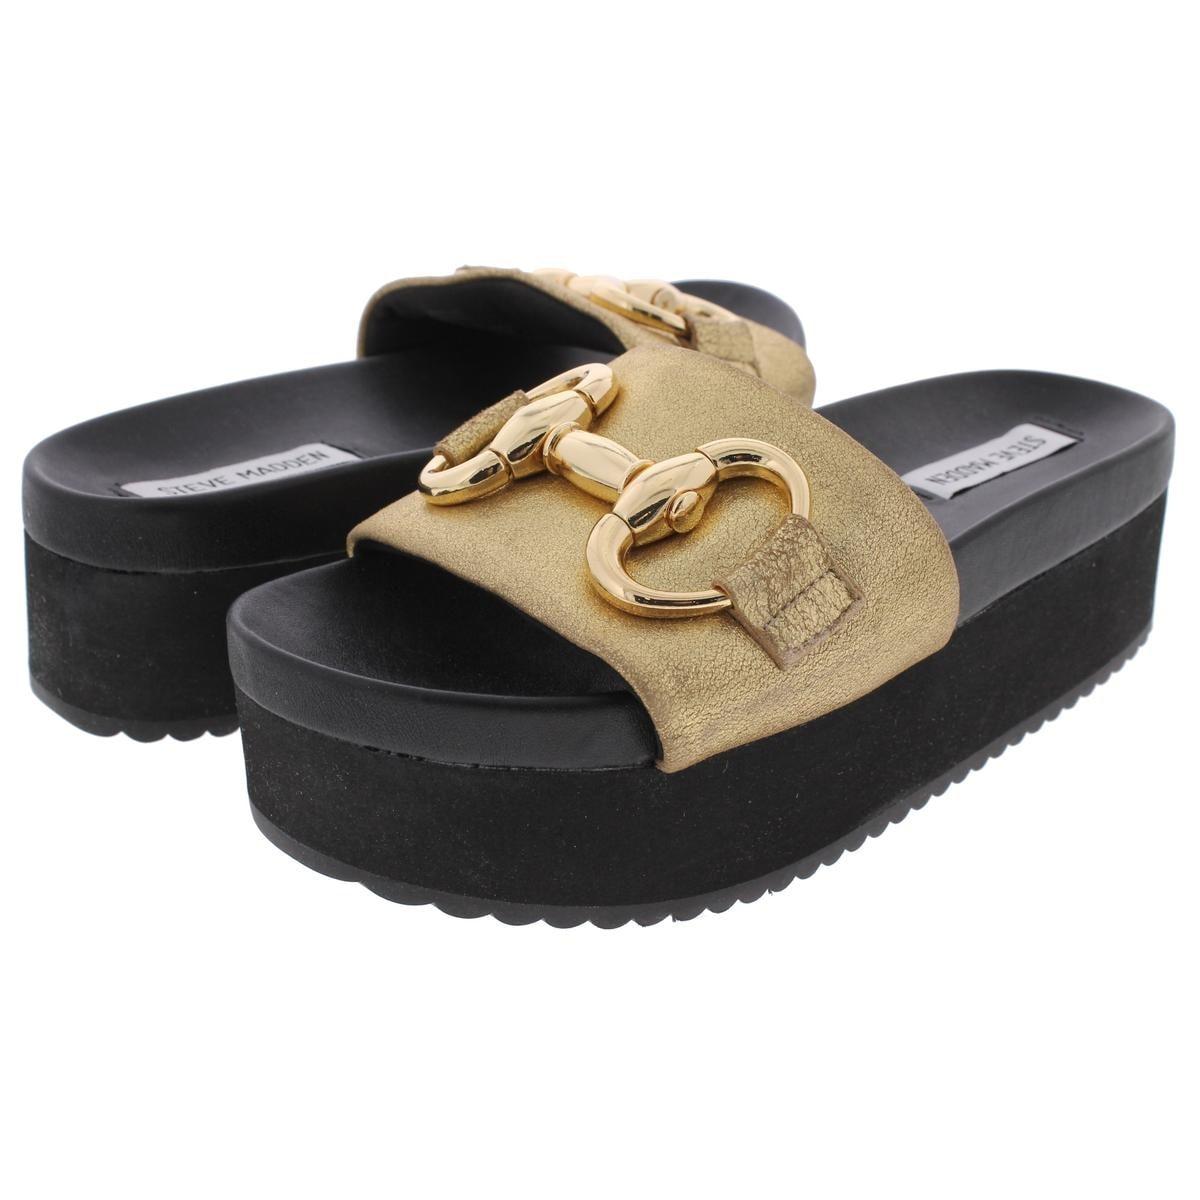 c92d4f9cd06 Shop Steve Madden Womens Jericho Slide Sandals Open Toe Embellished - Ships  To Canada - Overstock - 20742753